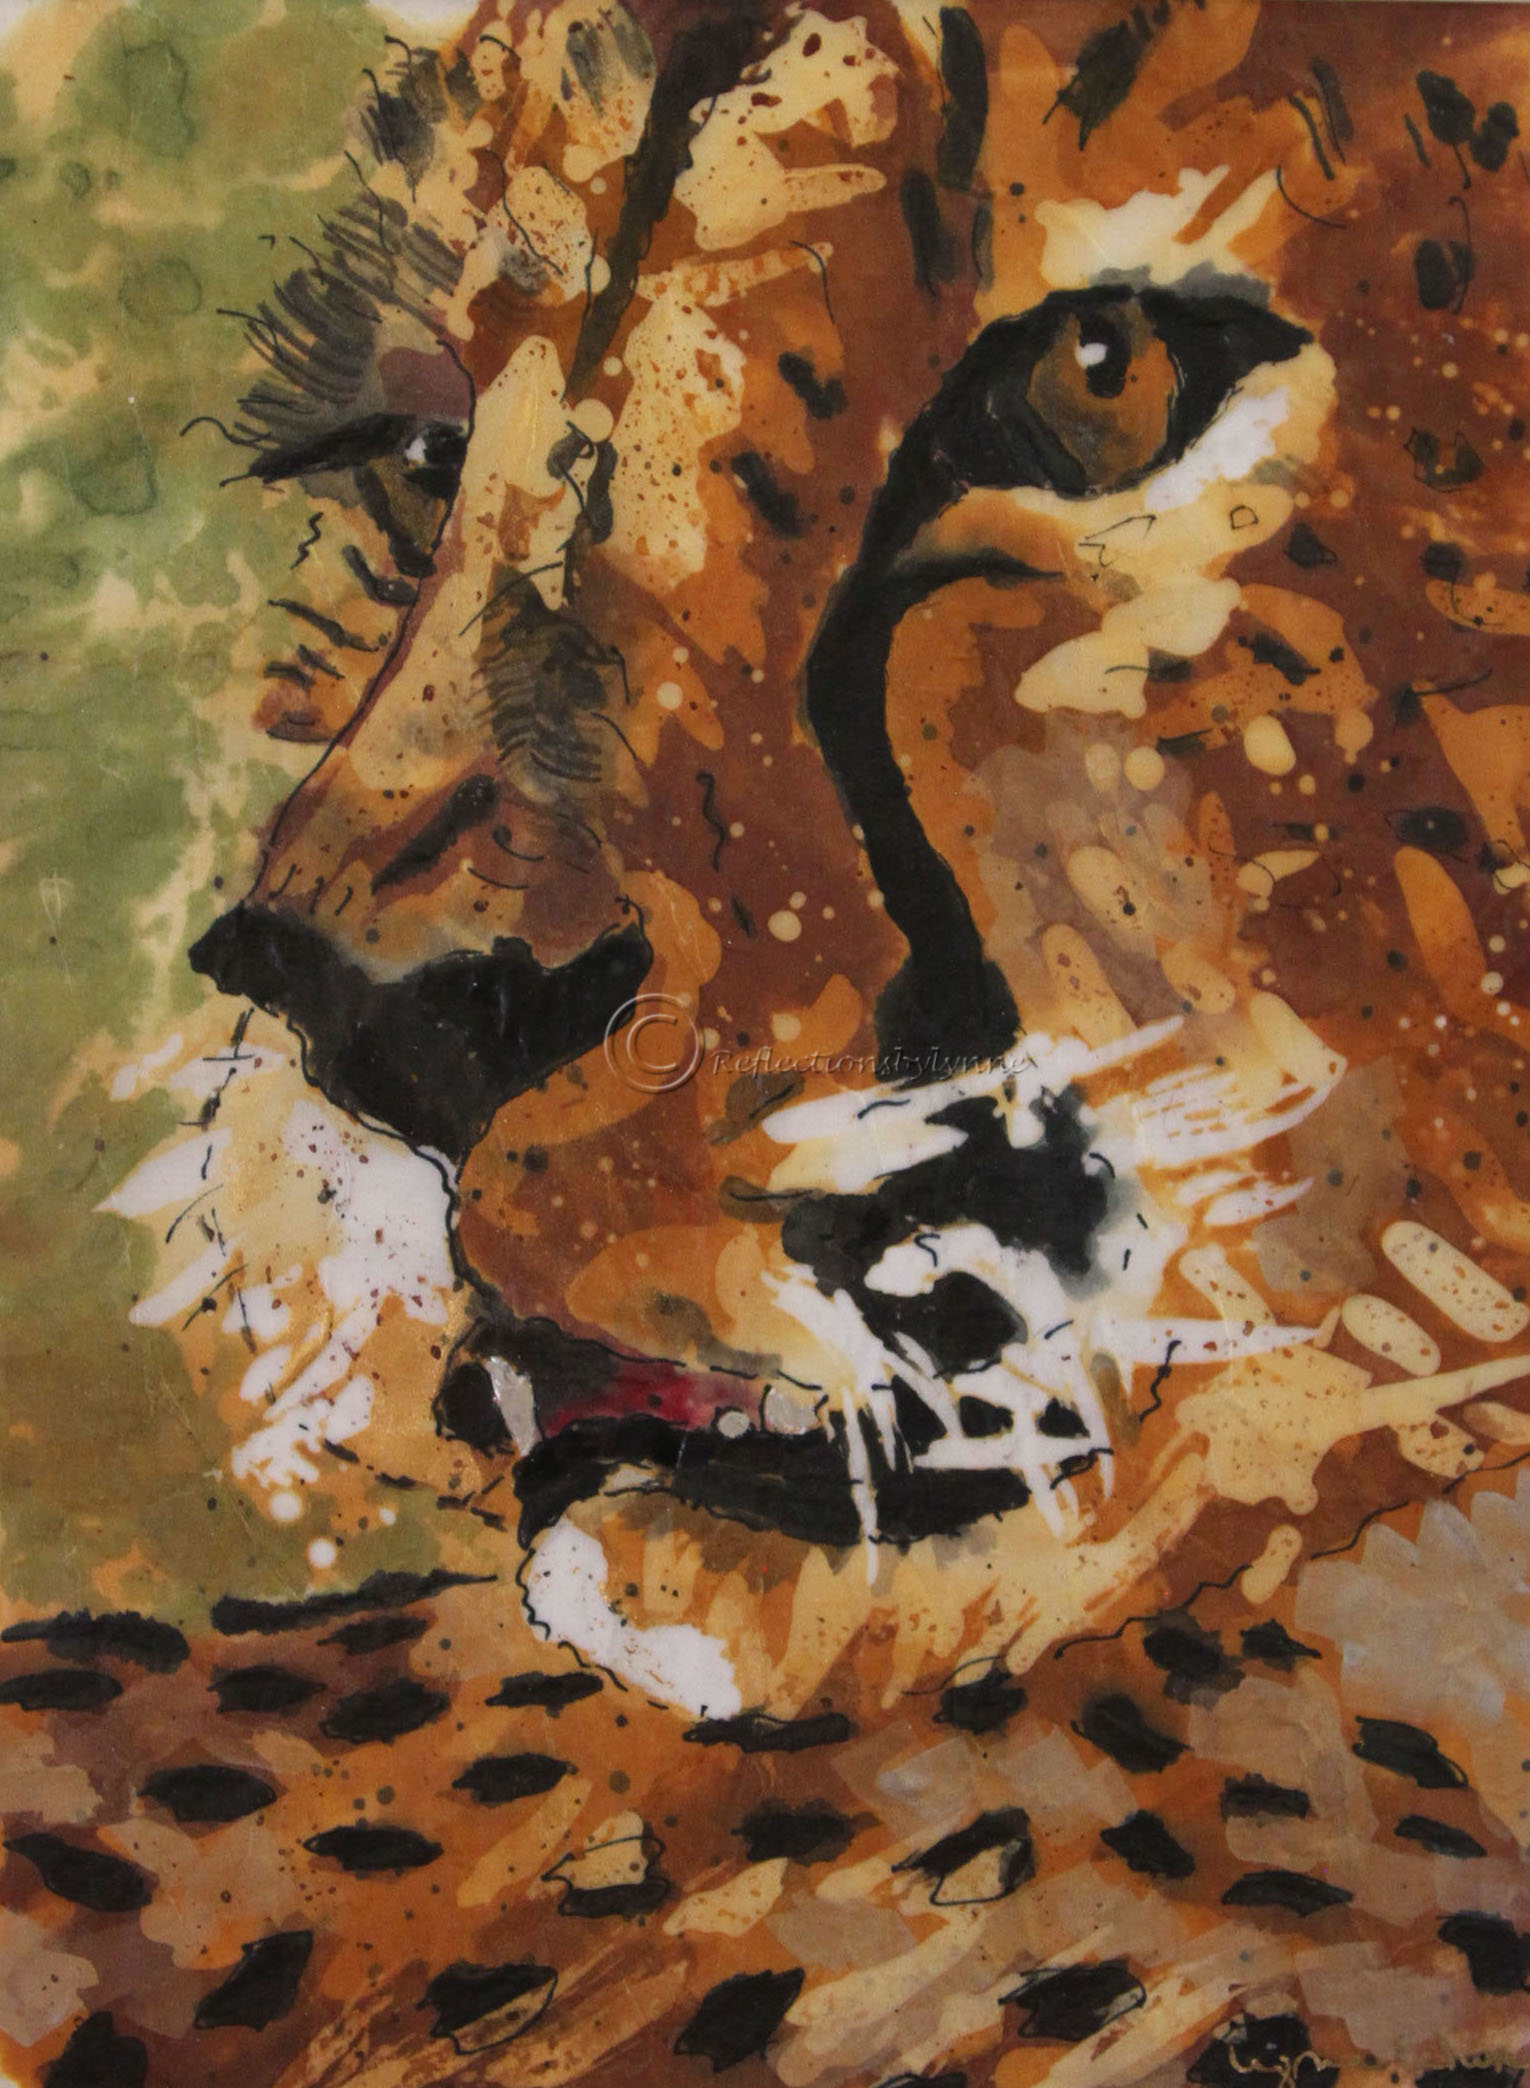 Edwards_Cheetah Profile.JPG